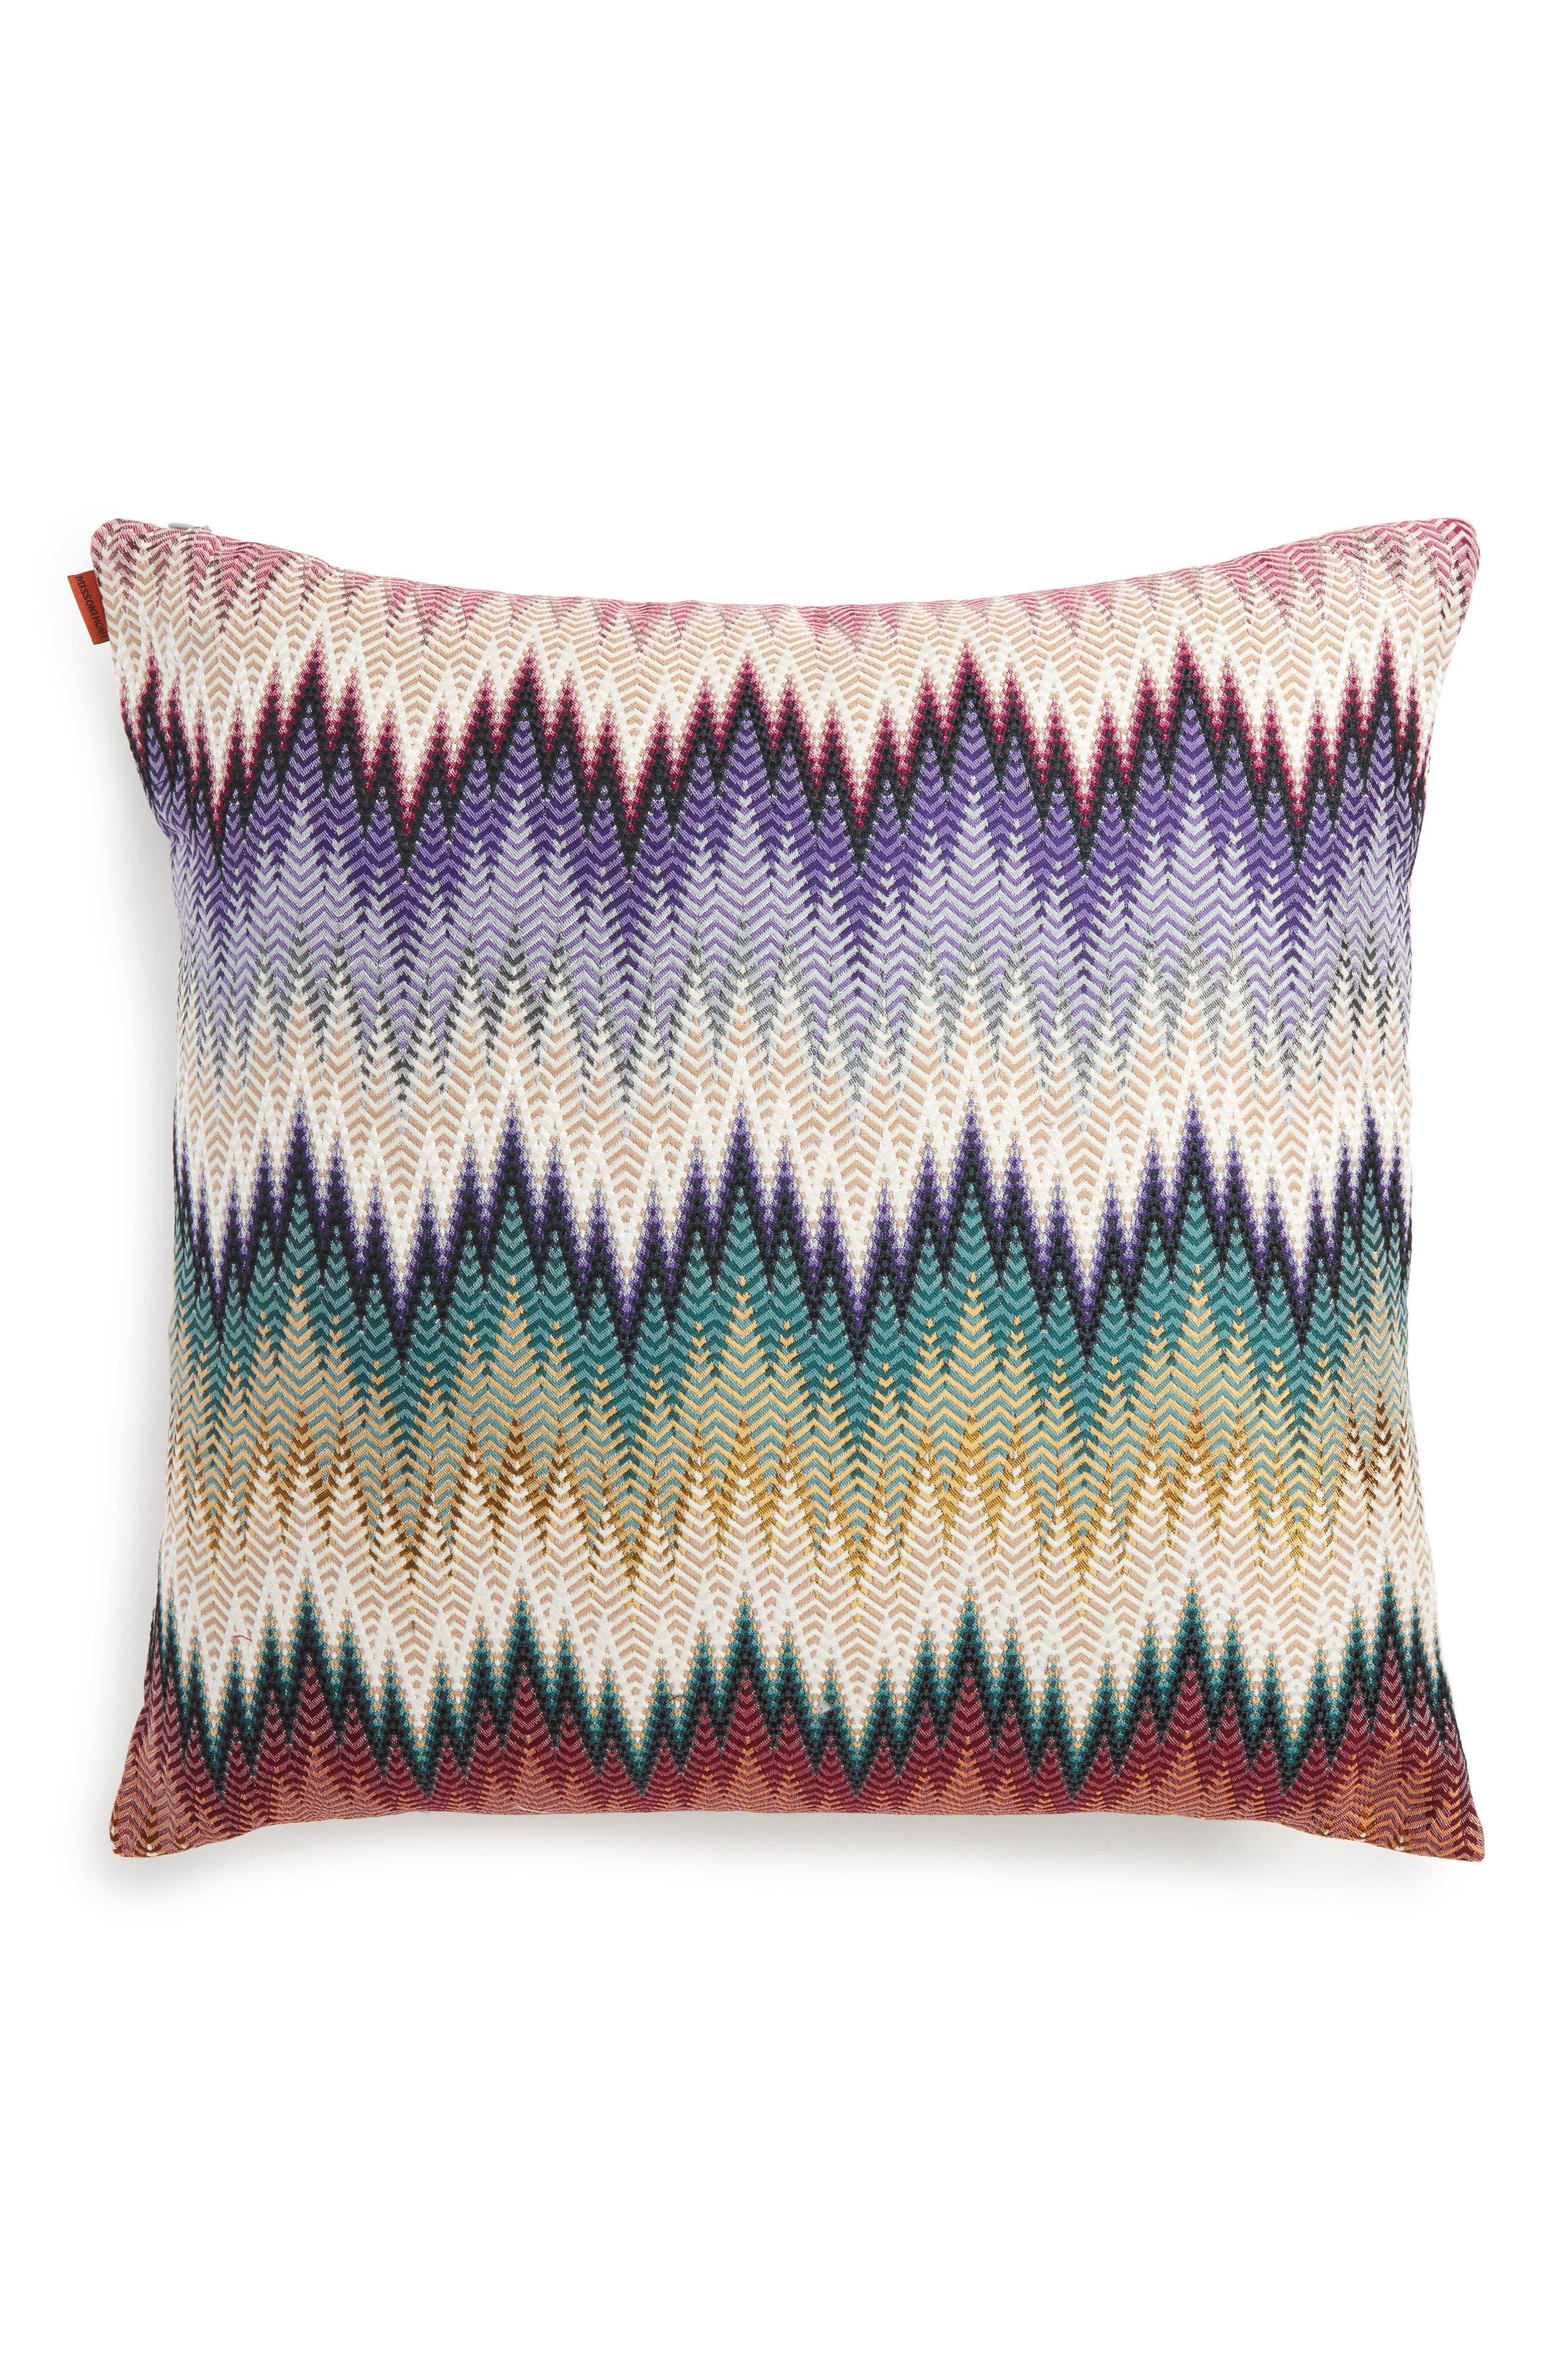 Alternate Image 1 Selected - Missoni Phrae Accent Pillow